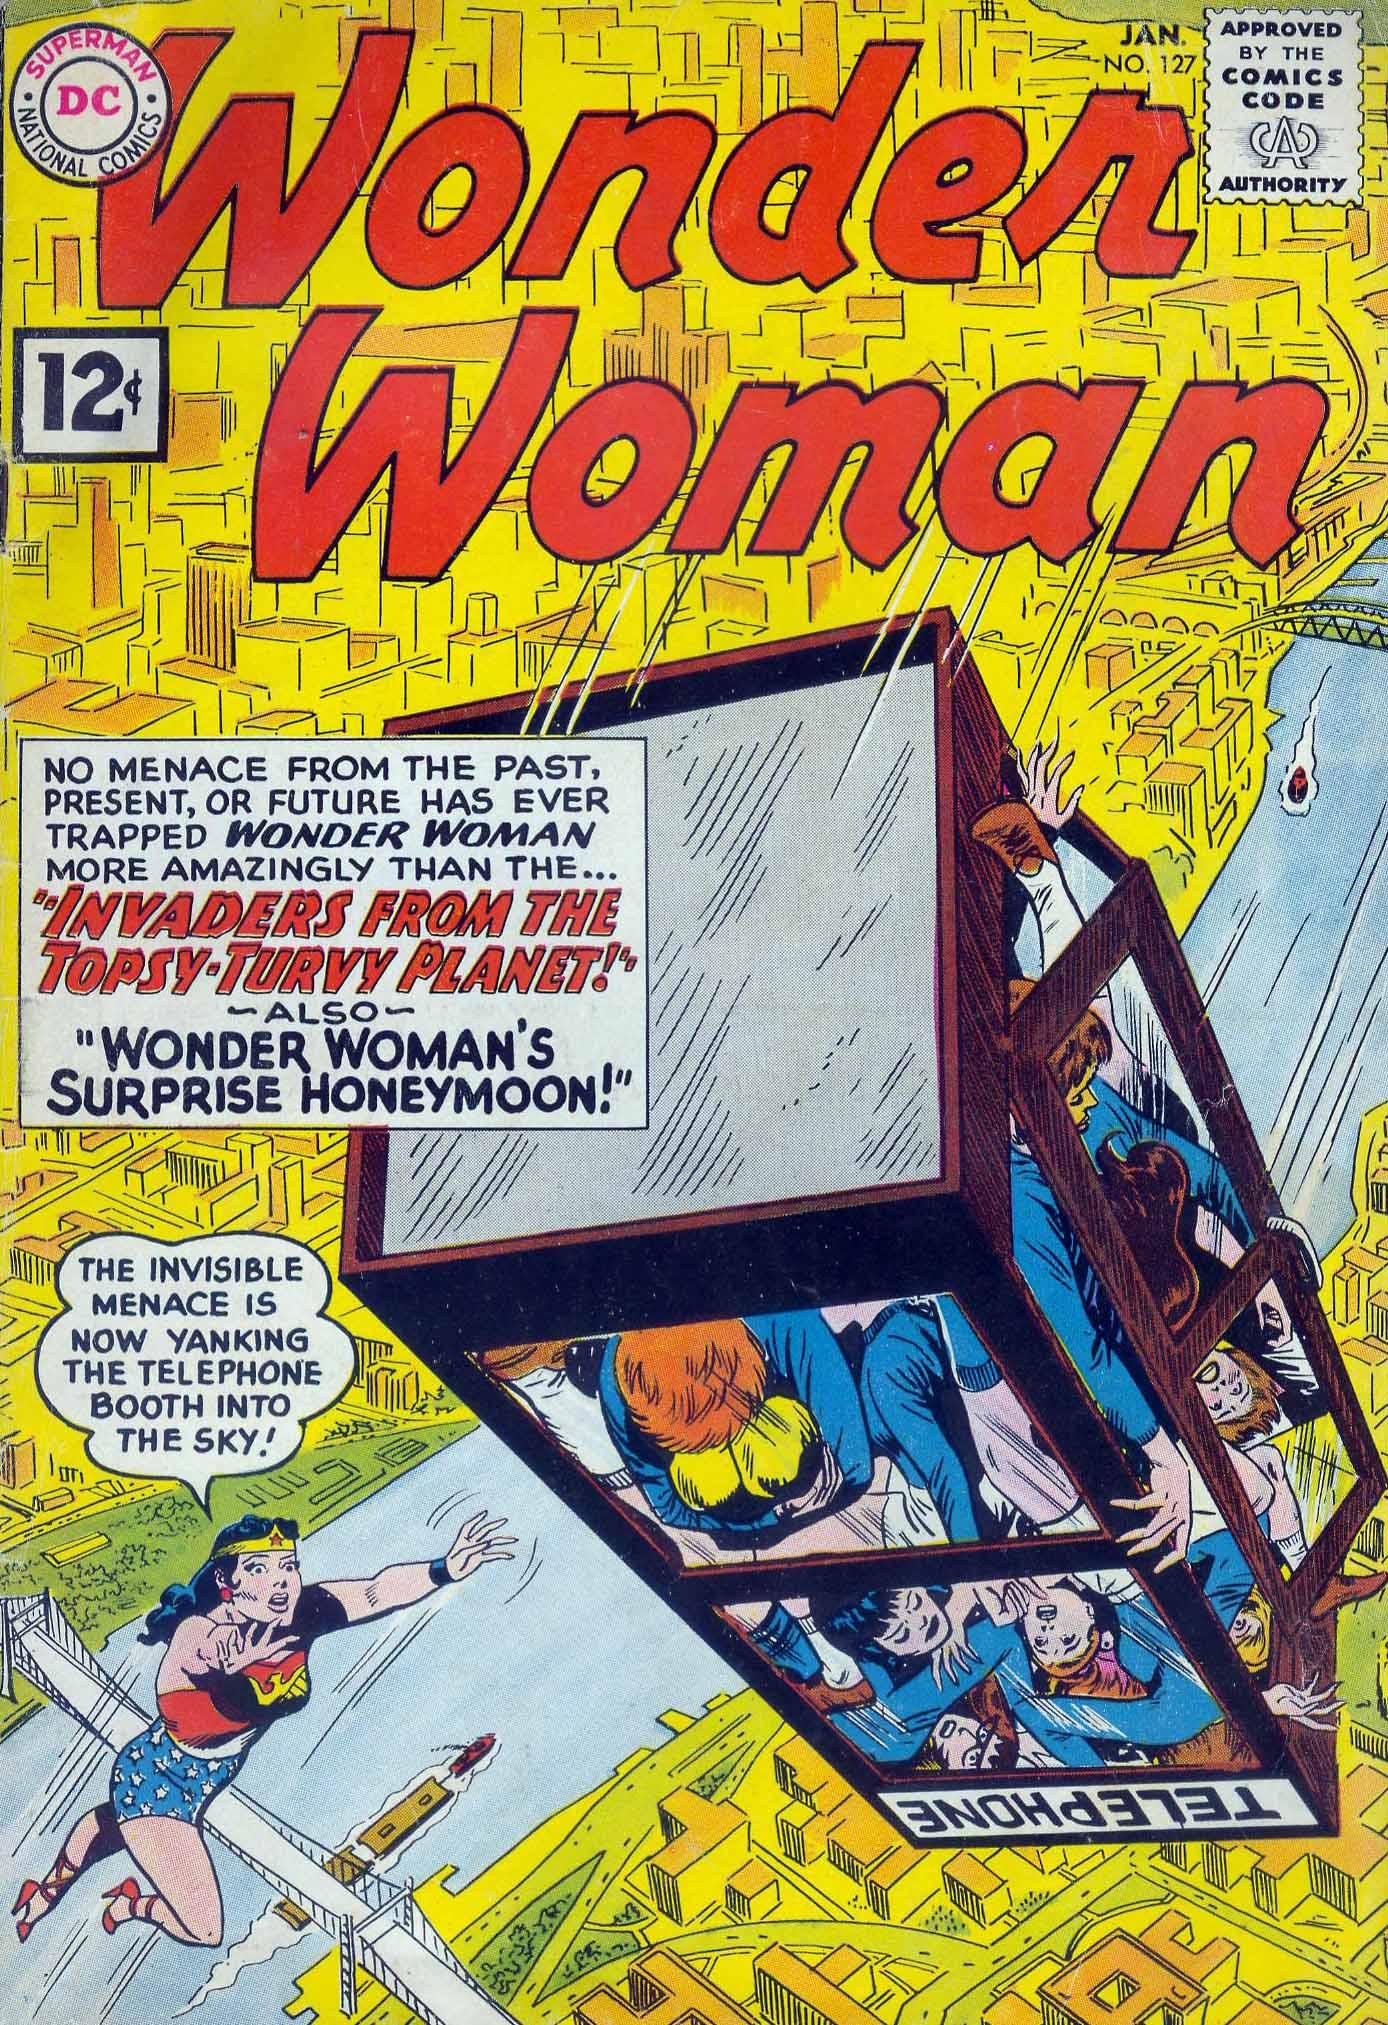 Read online Wonder Woman (1942) comic -  Issue #127 - 1